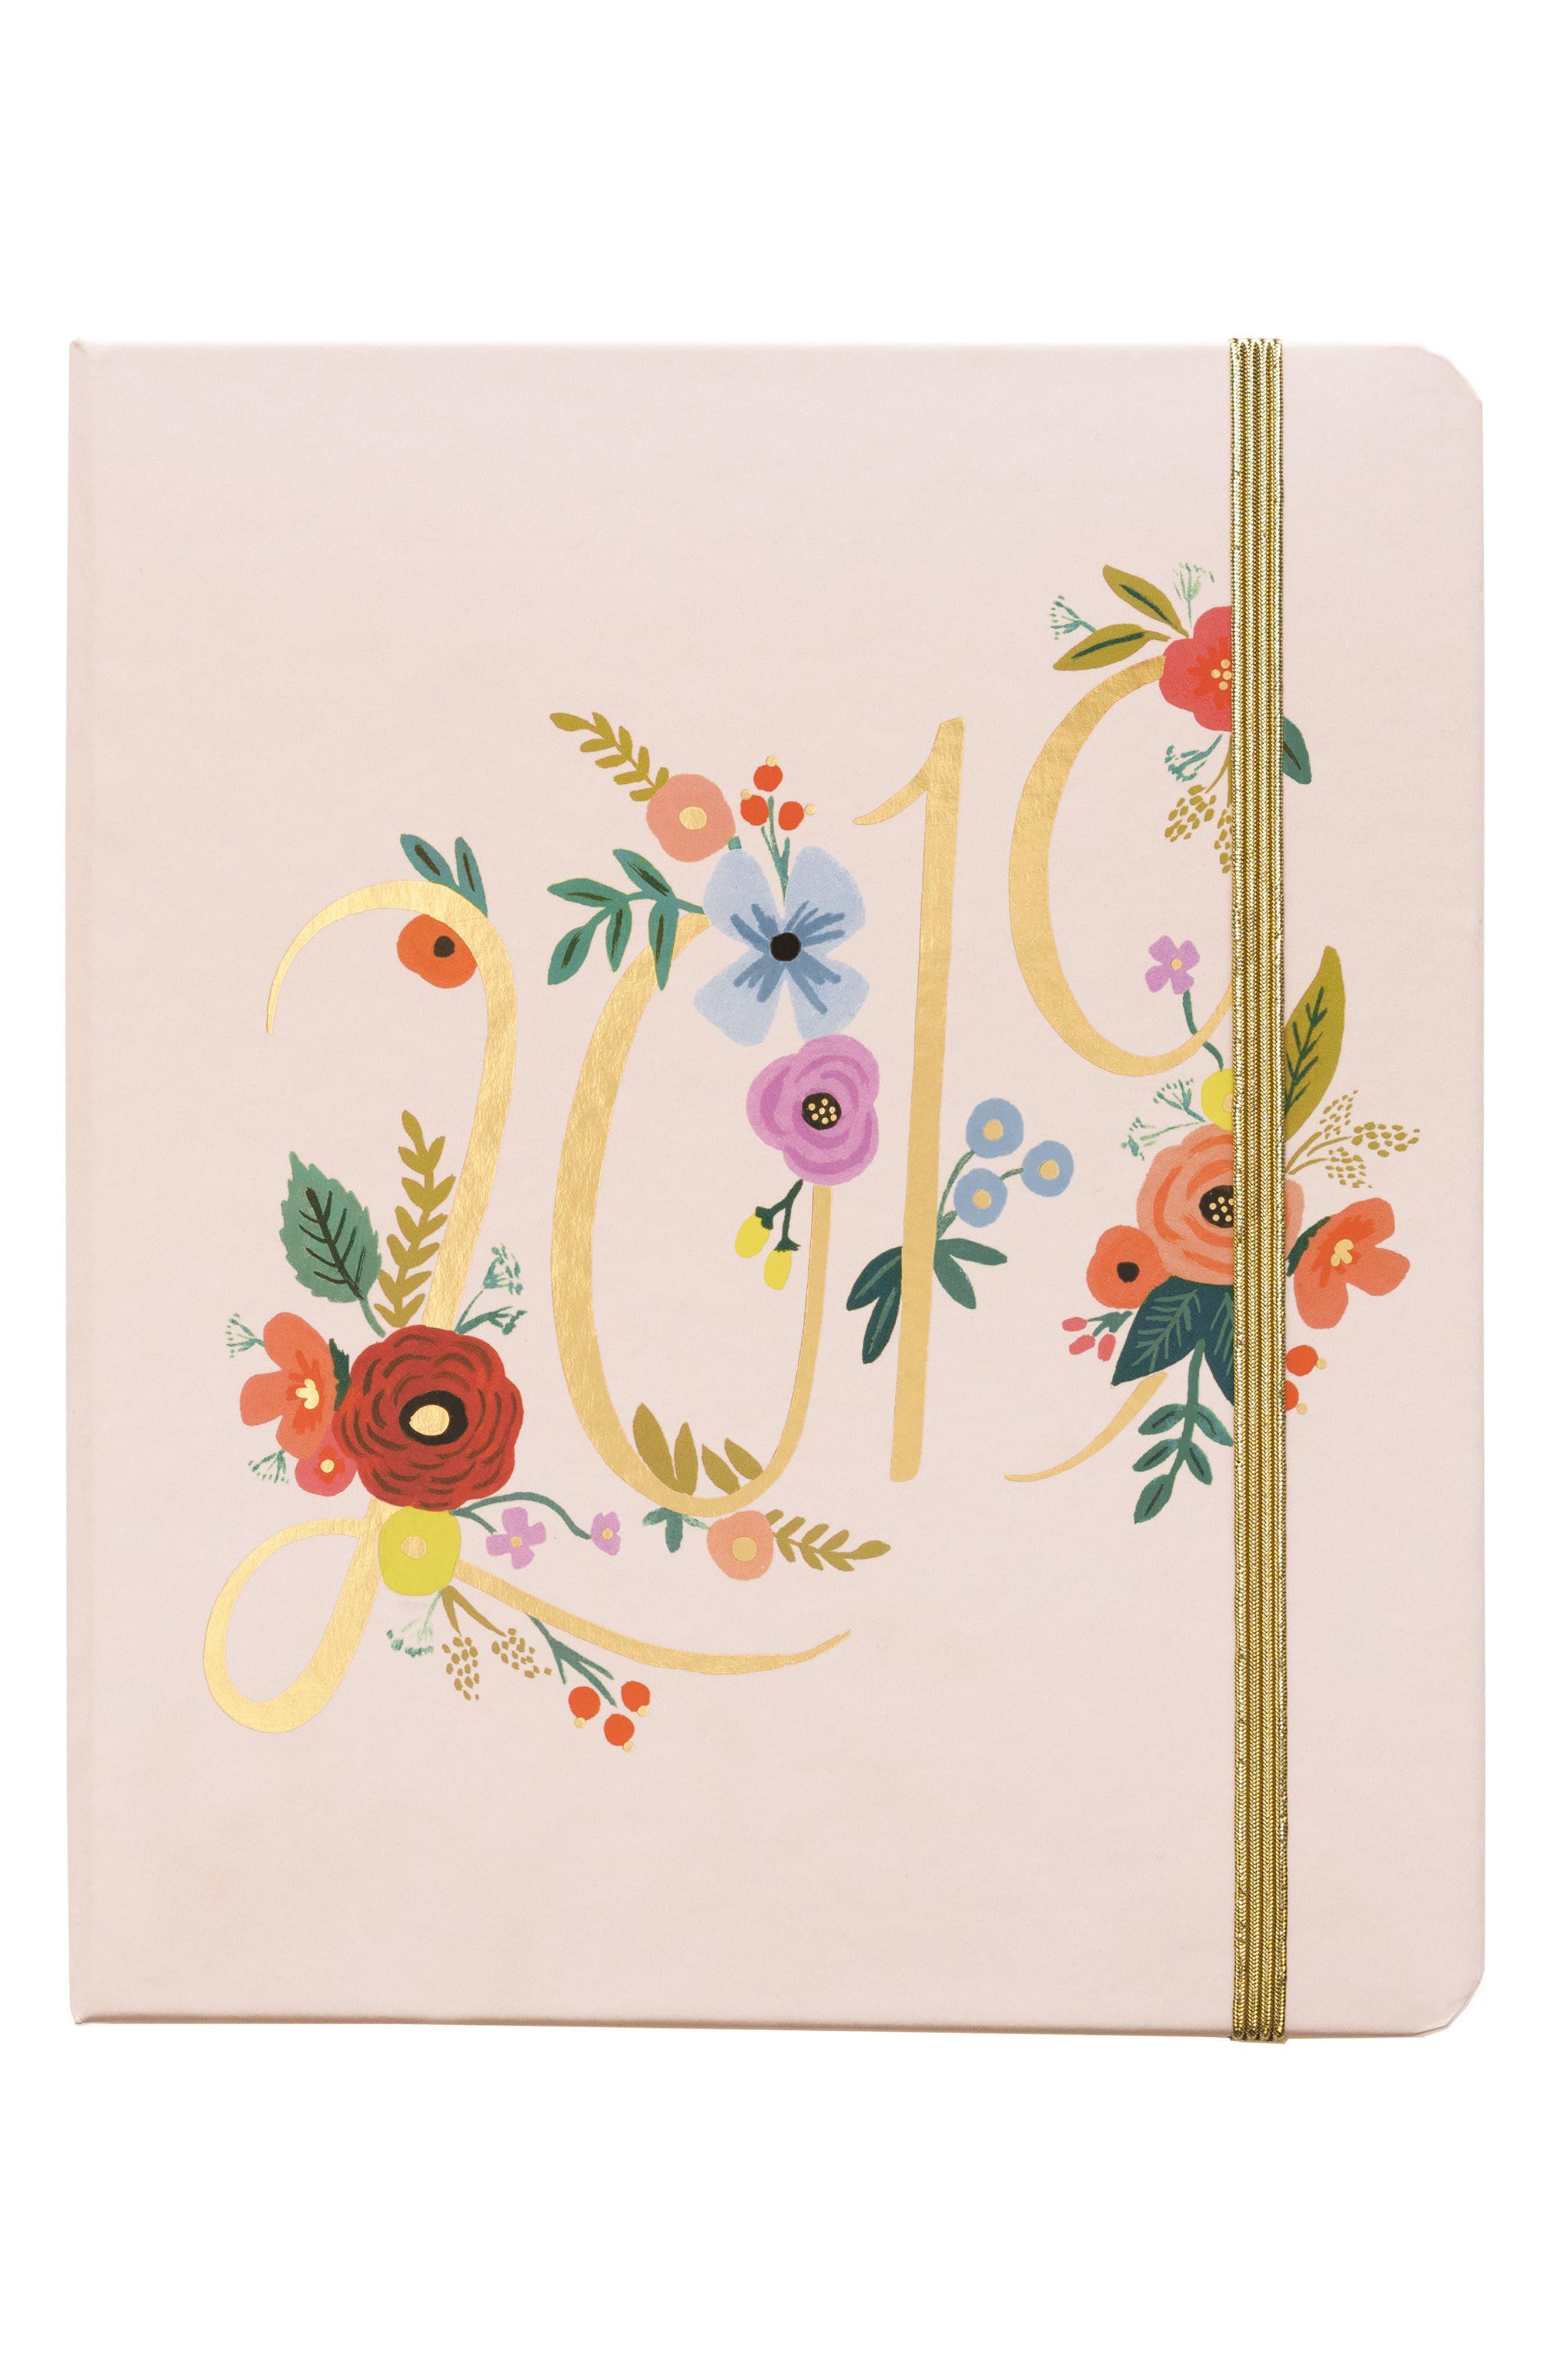 2019 Bouquet 17-Month Planner,                         Main,                         color, PINK